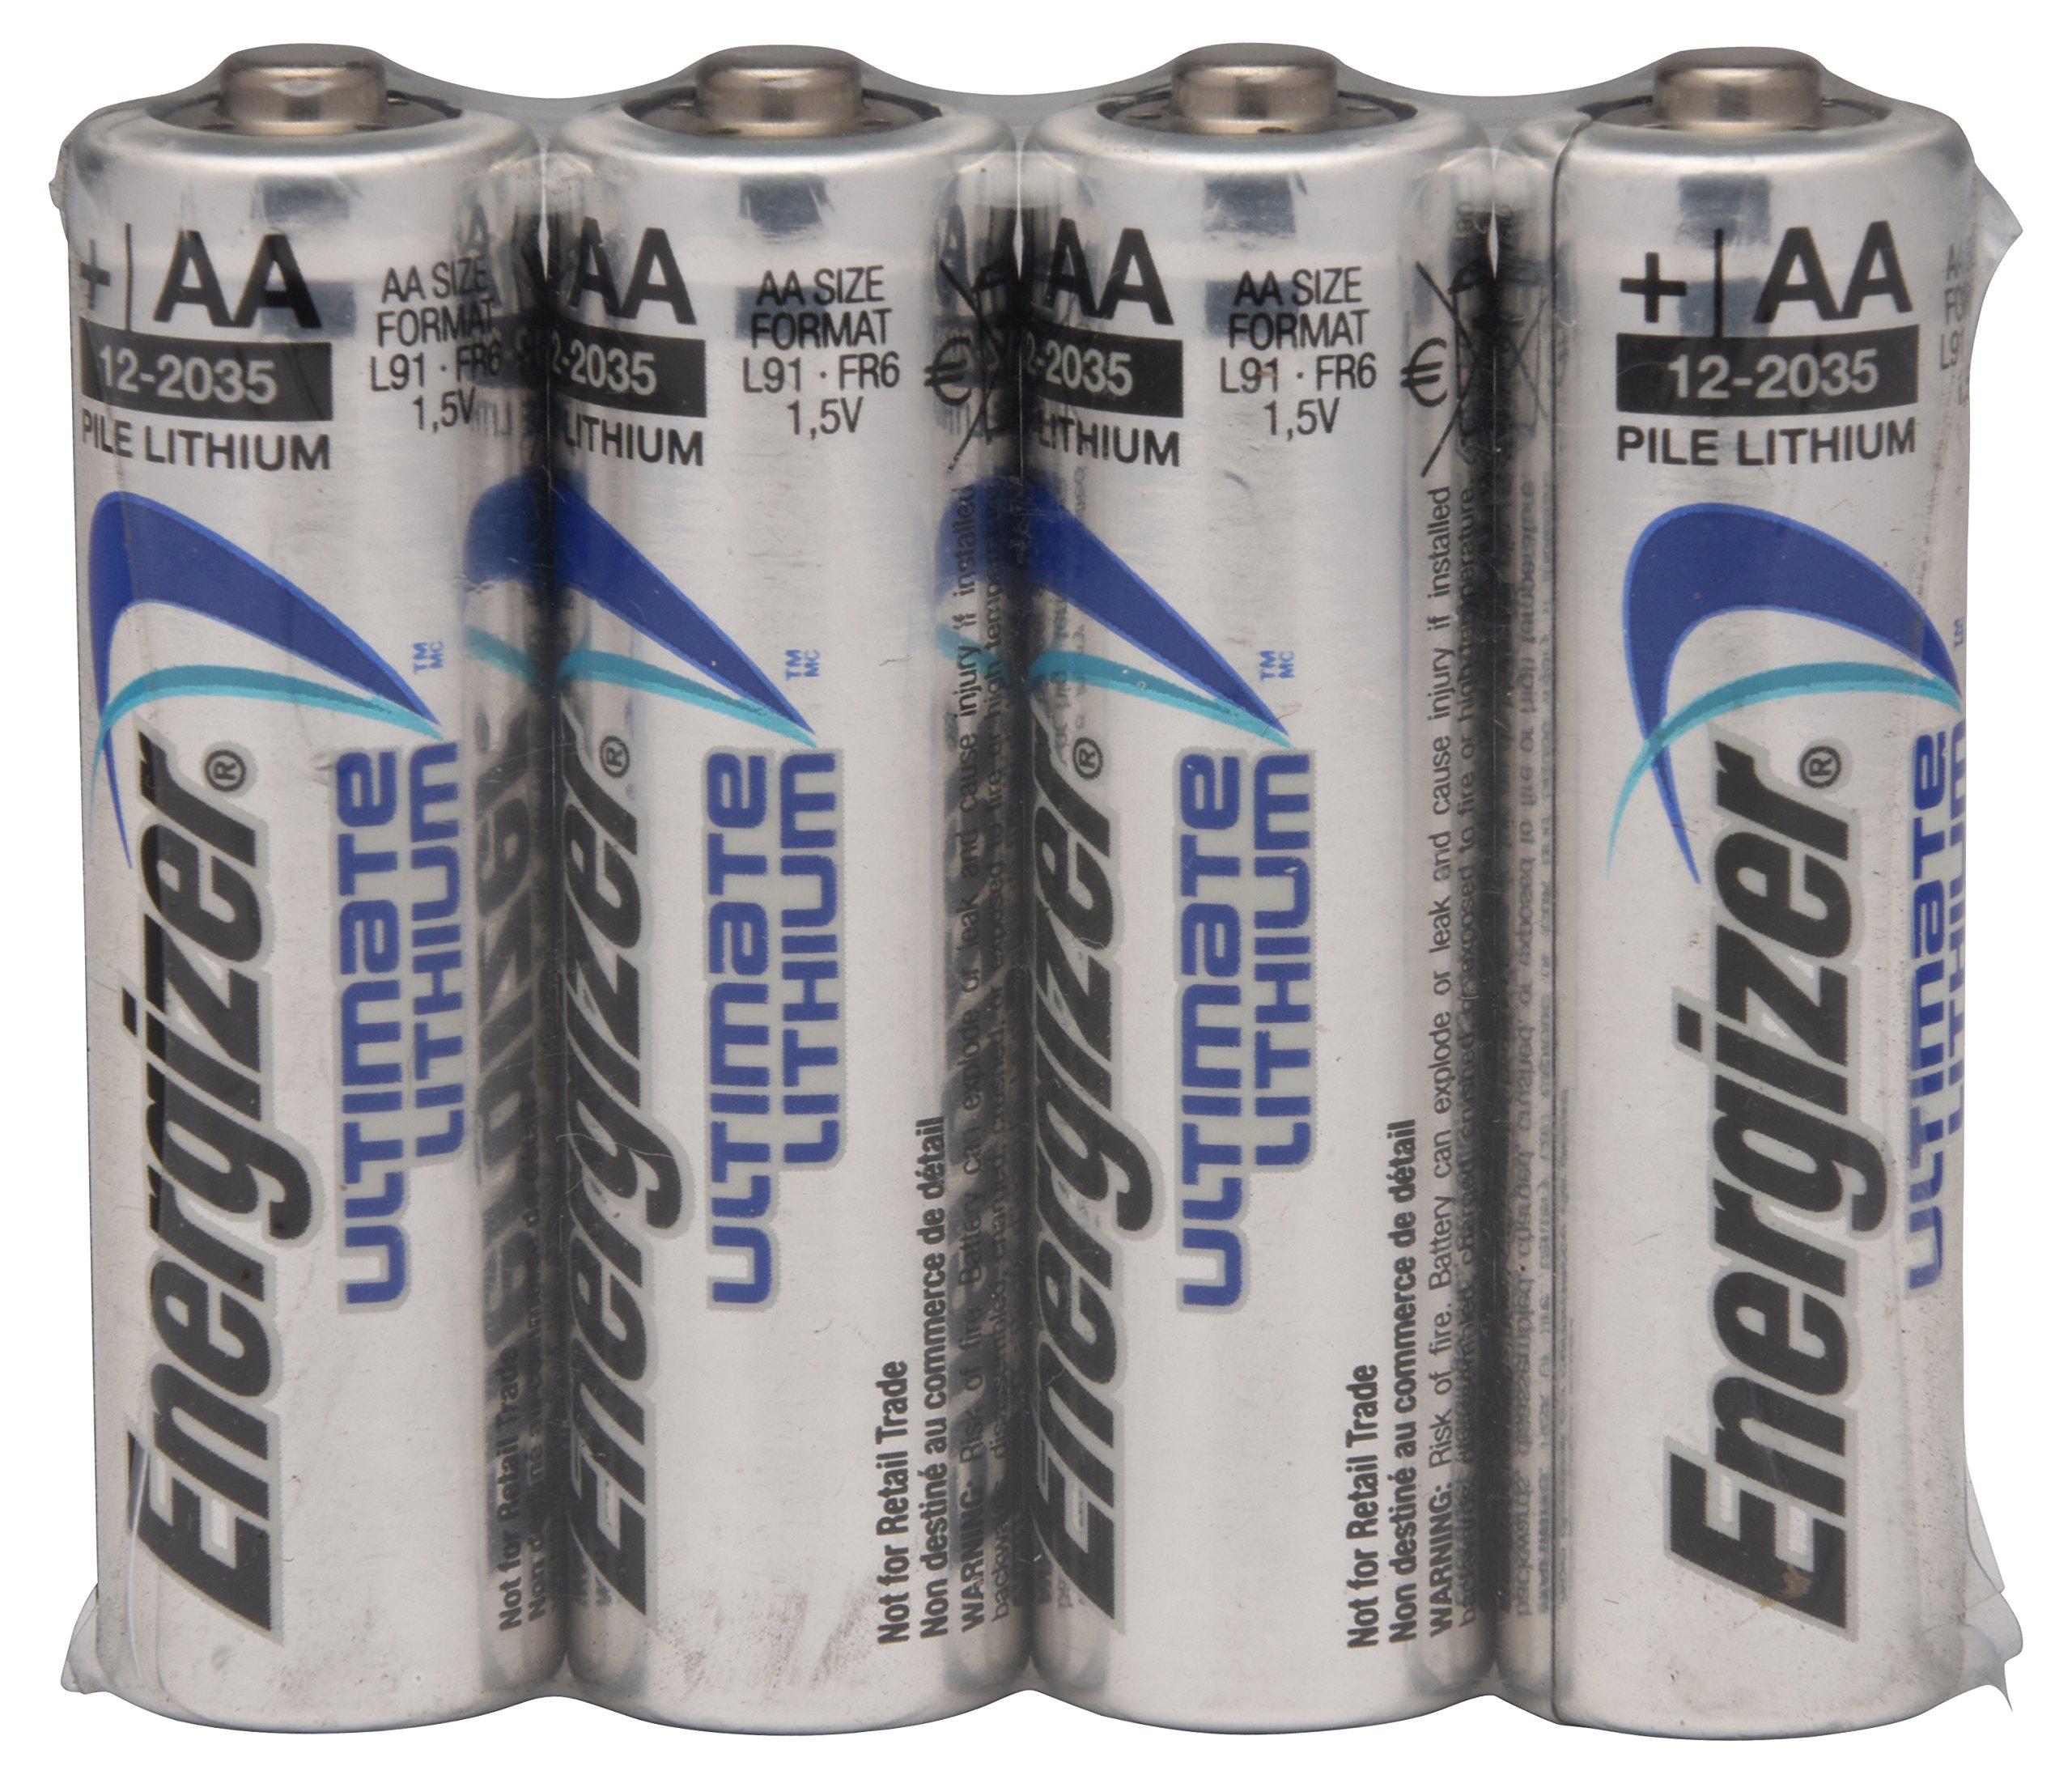 Zurn PTR6200-BAT-LITH Commercial Brass PTR6200 Long-Life Lithium Battery, Compatible with ZTR Flush Valves, Flushometer Repair Part